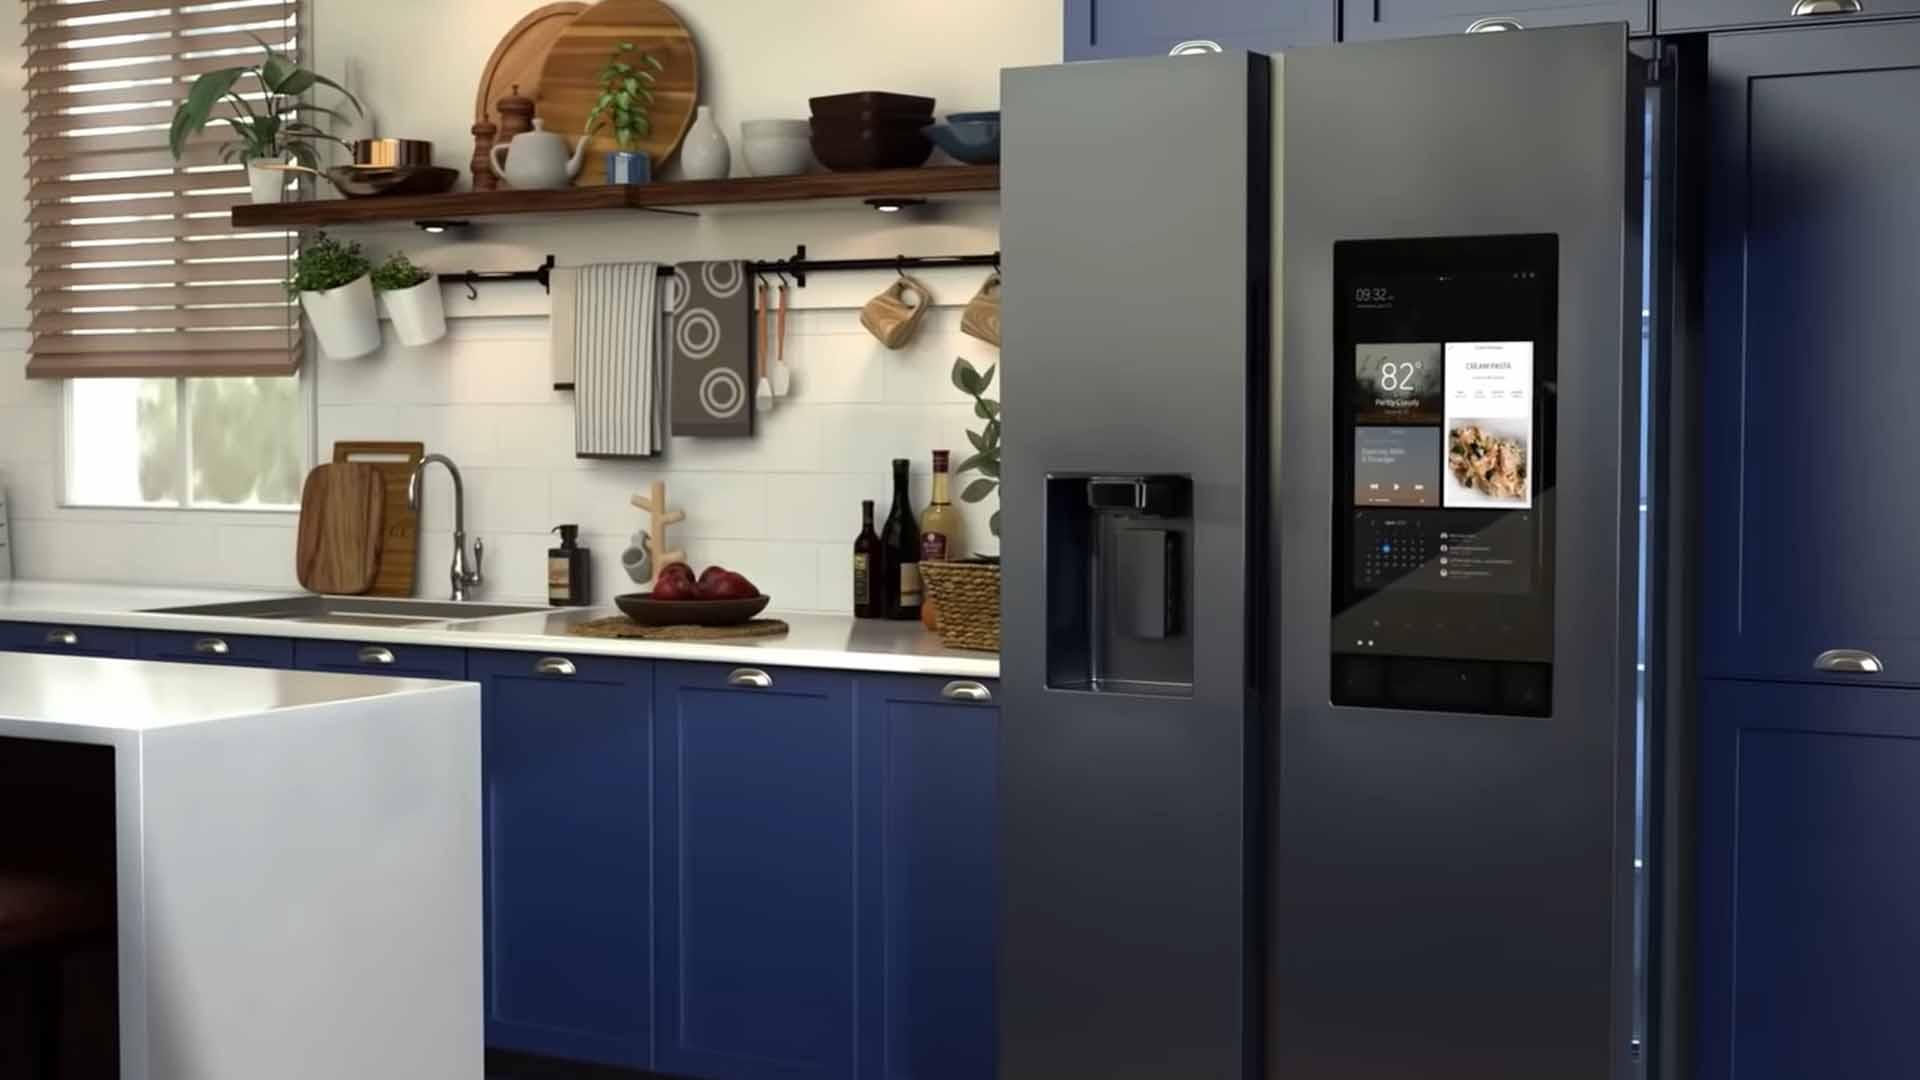 Samsung Refrigerator Repair Services   Samsung Appliance Repairs